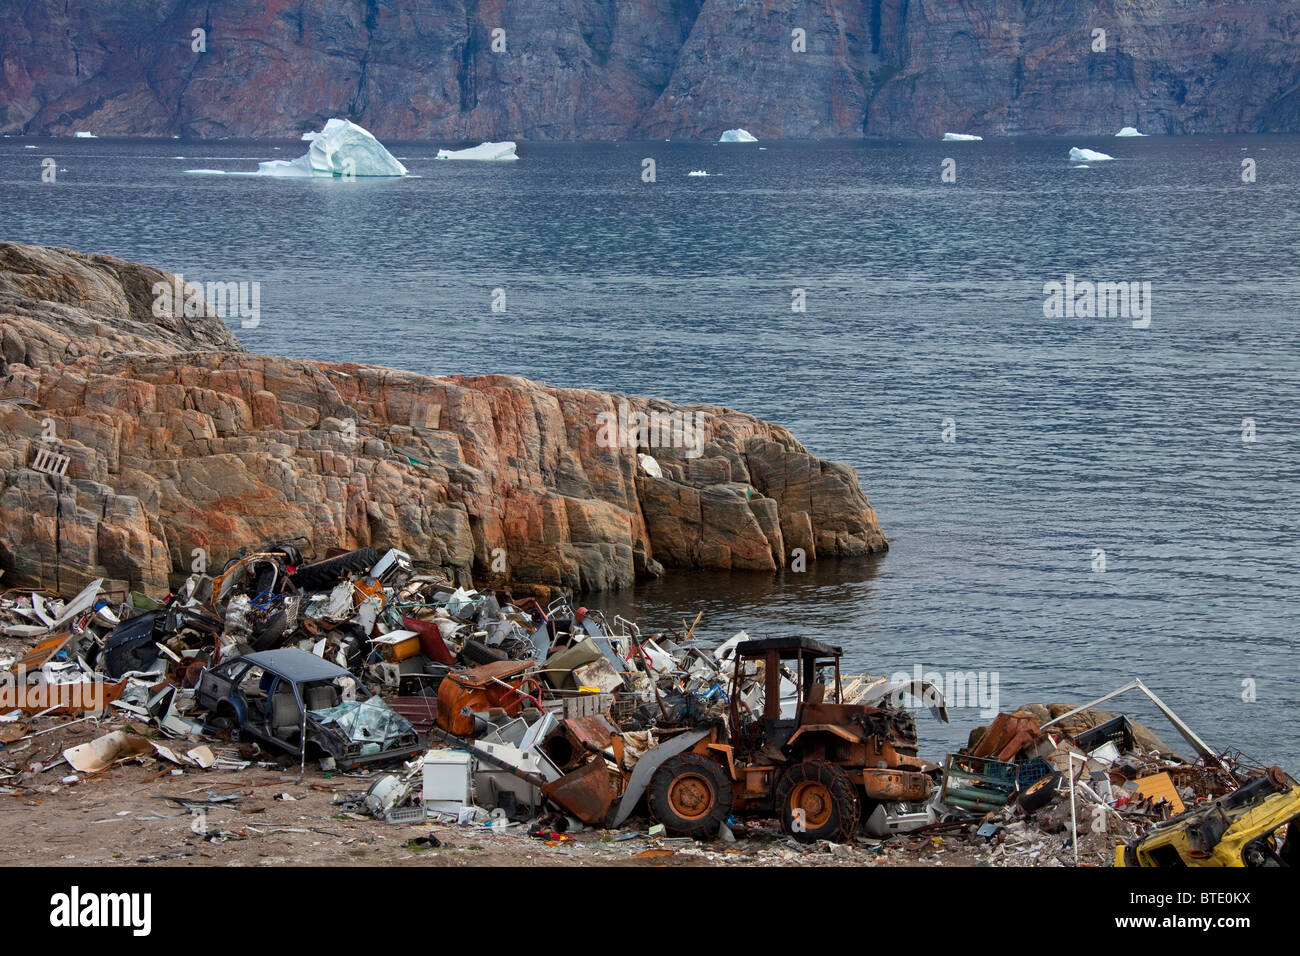 Rubbish at garbage dump and icebergs at the fishing village Uummannaq, Greenland - Stock Image